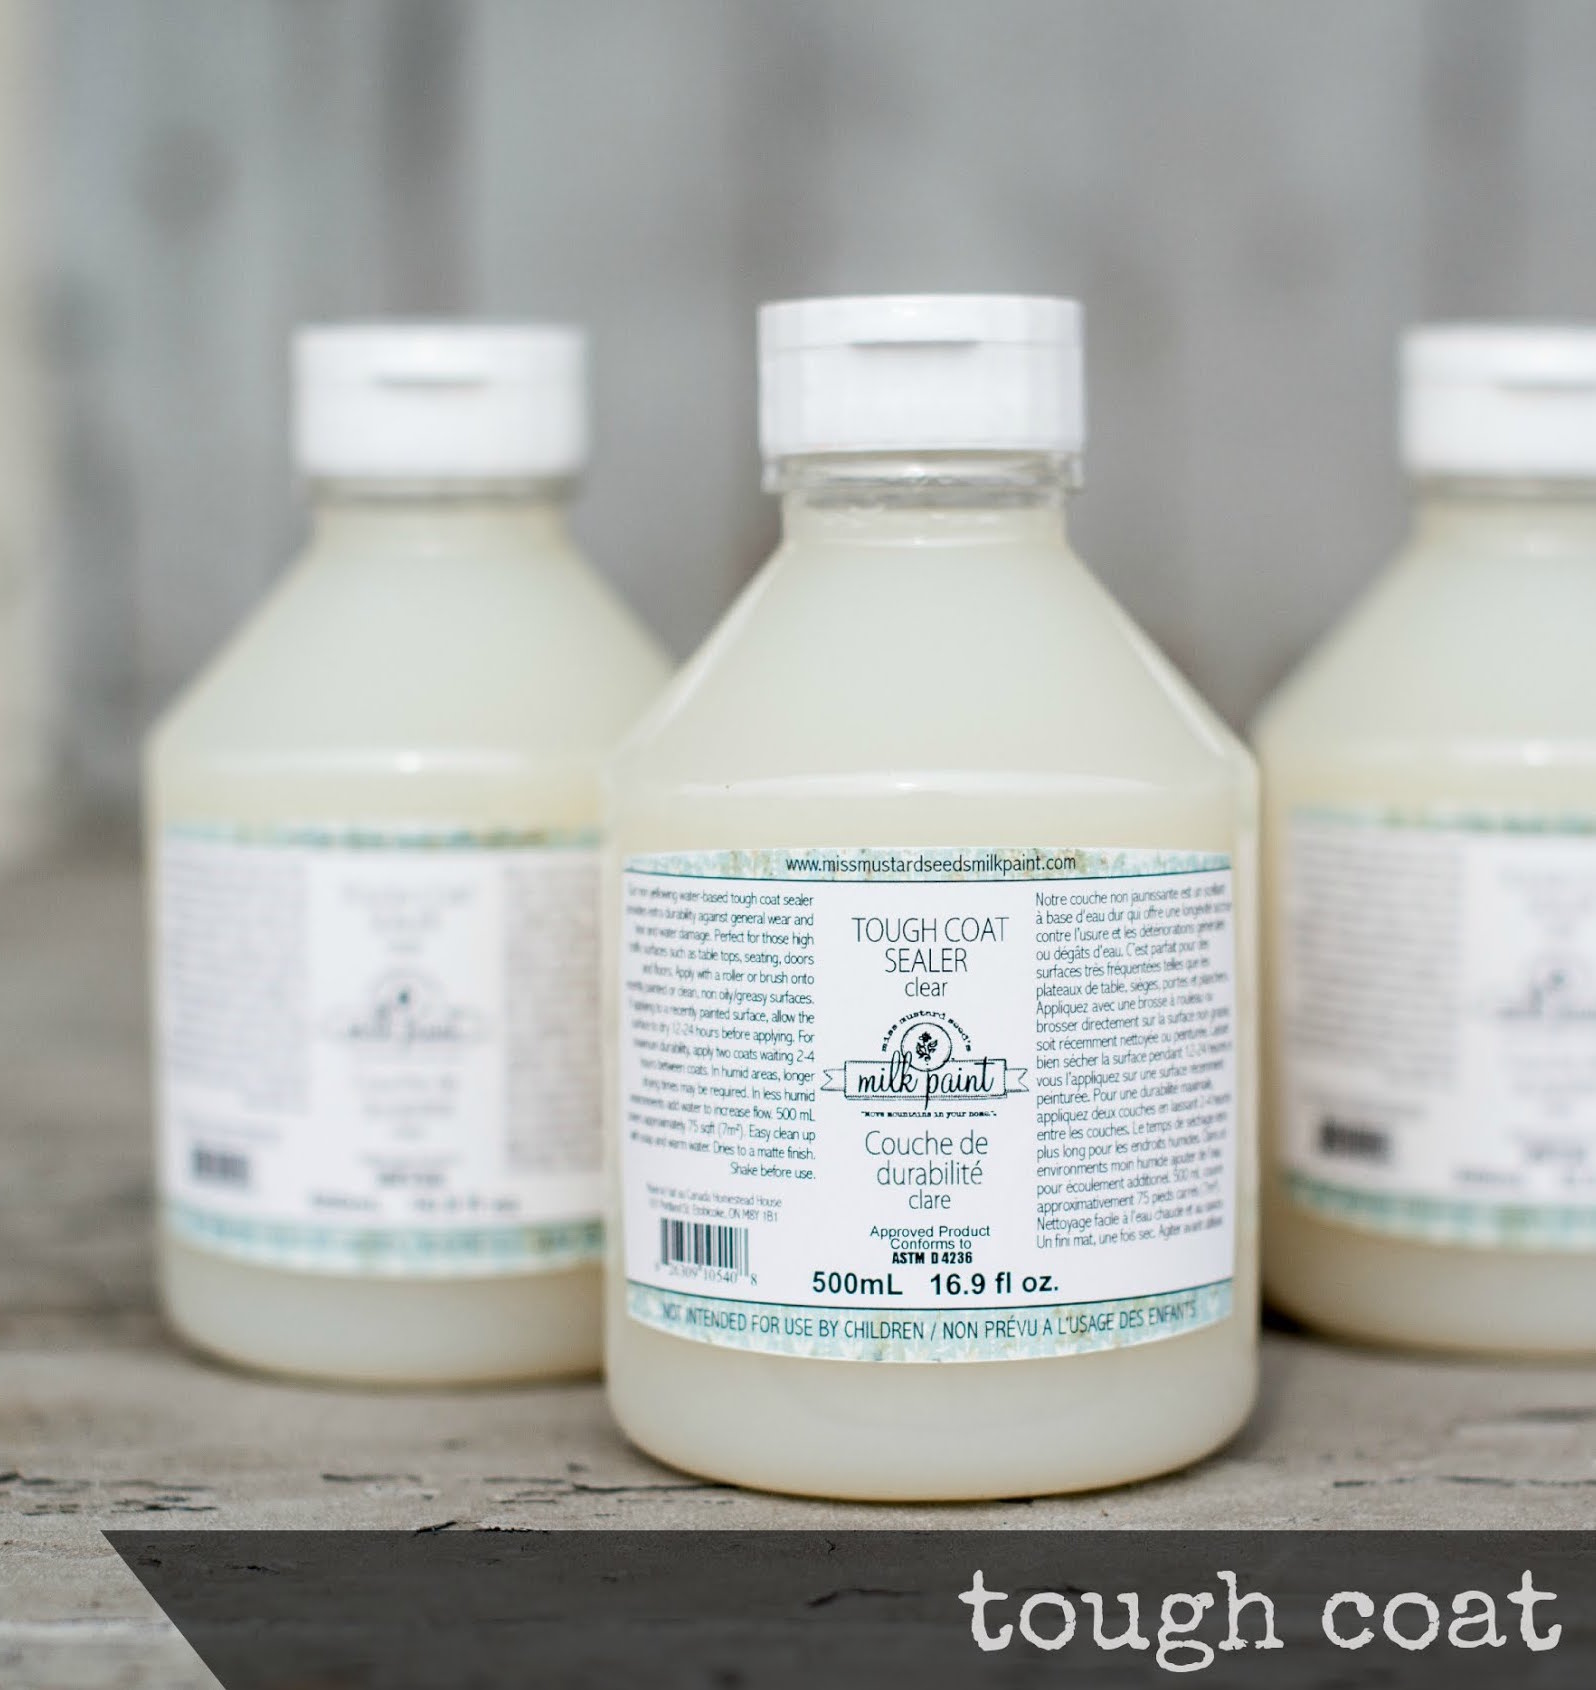 Tough Coat - Miss Mustard Seed Milk Paint